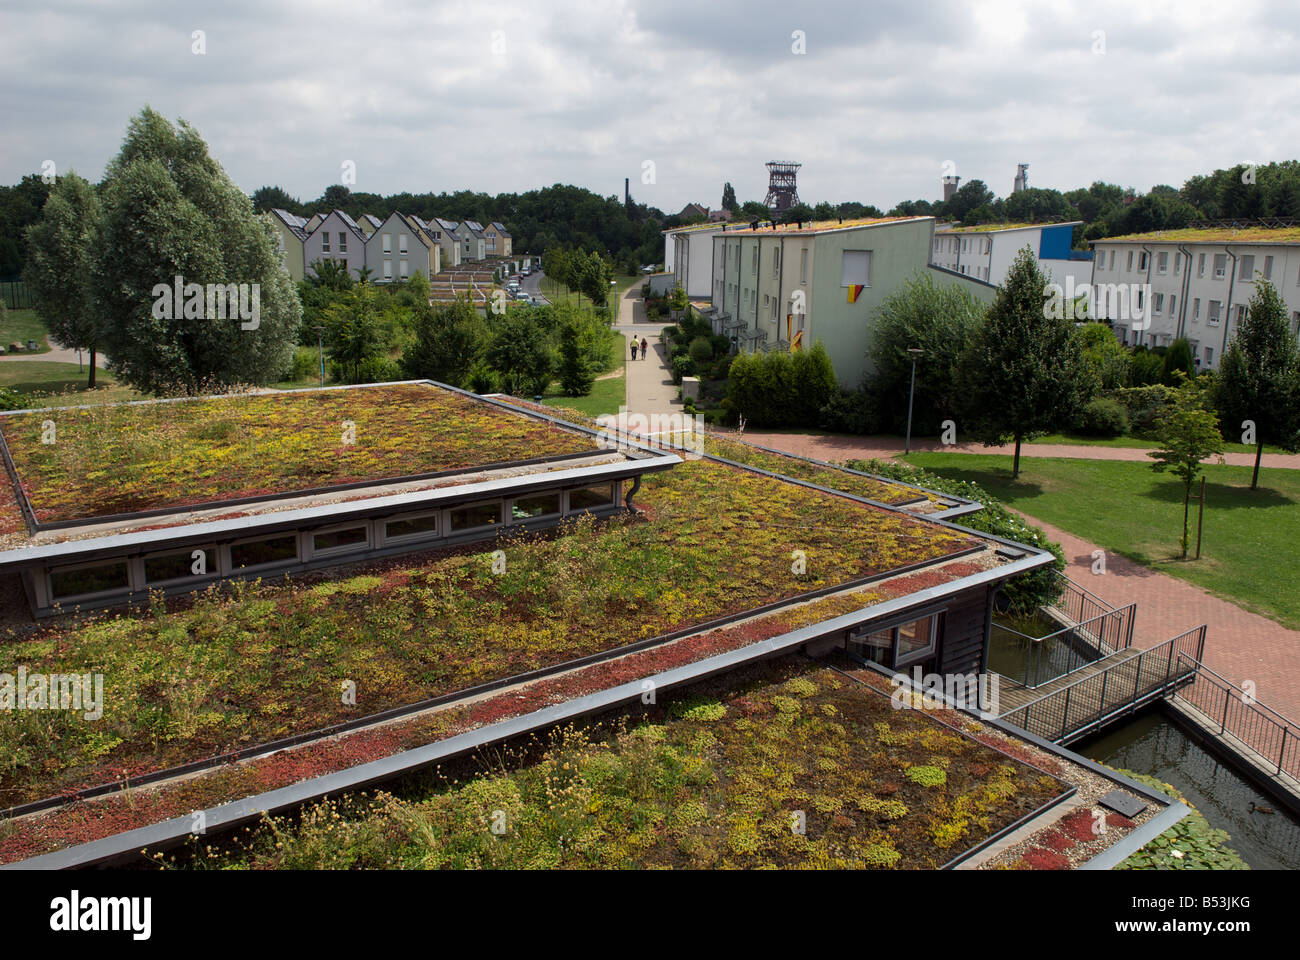 Sedum or 'living roof' on a school classroom in Gelsenkirchen, North Rhine-Westphalia, Germany. Stock Photo